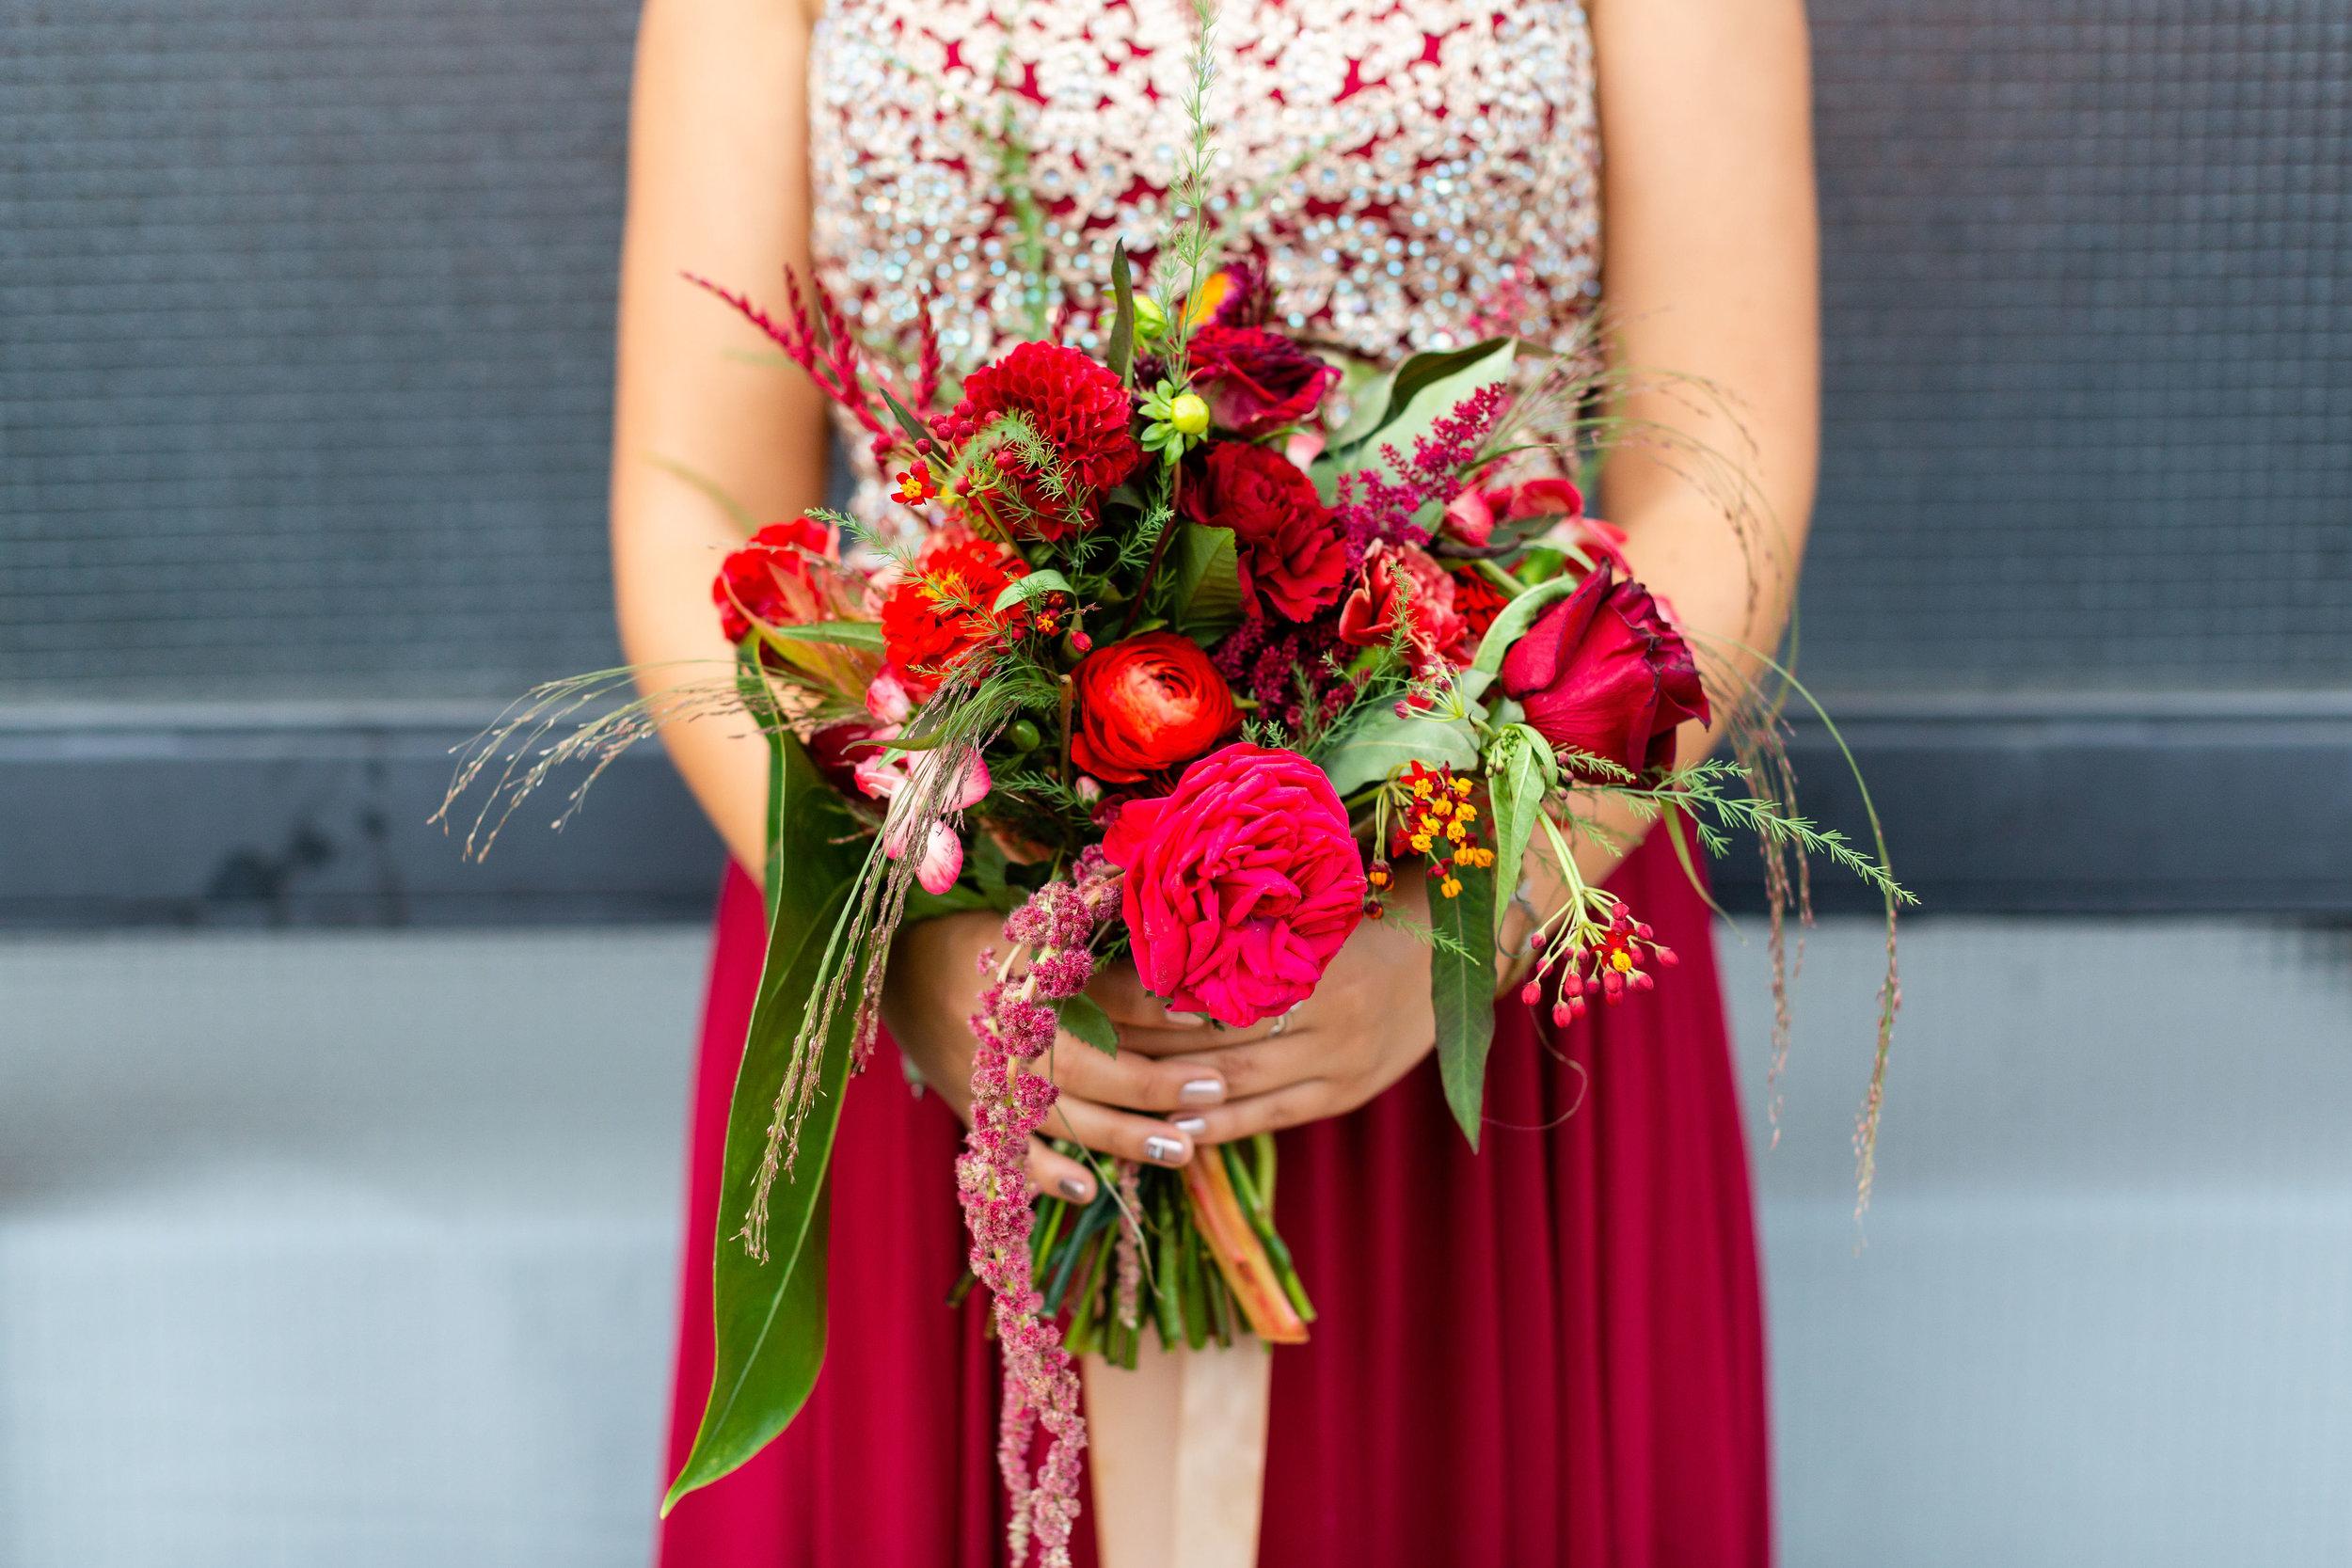 Elizabeth_Joab_multicultural_wedding_Petronella_Photography_790.jpg